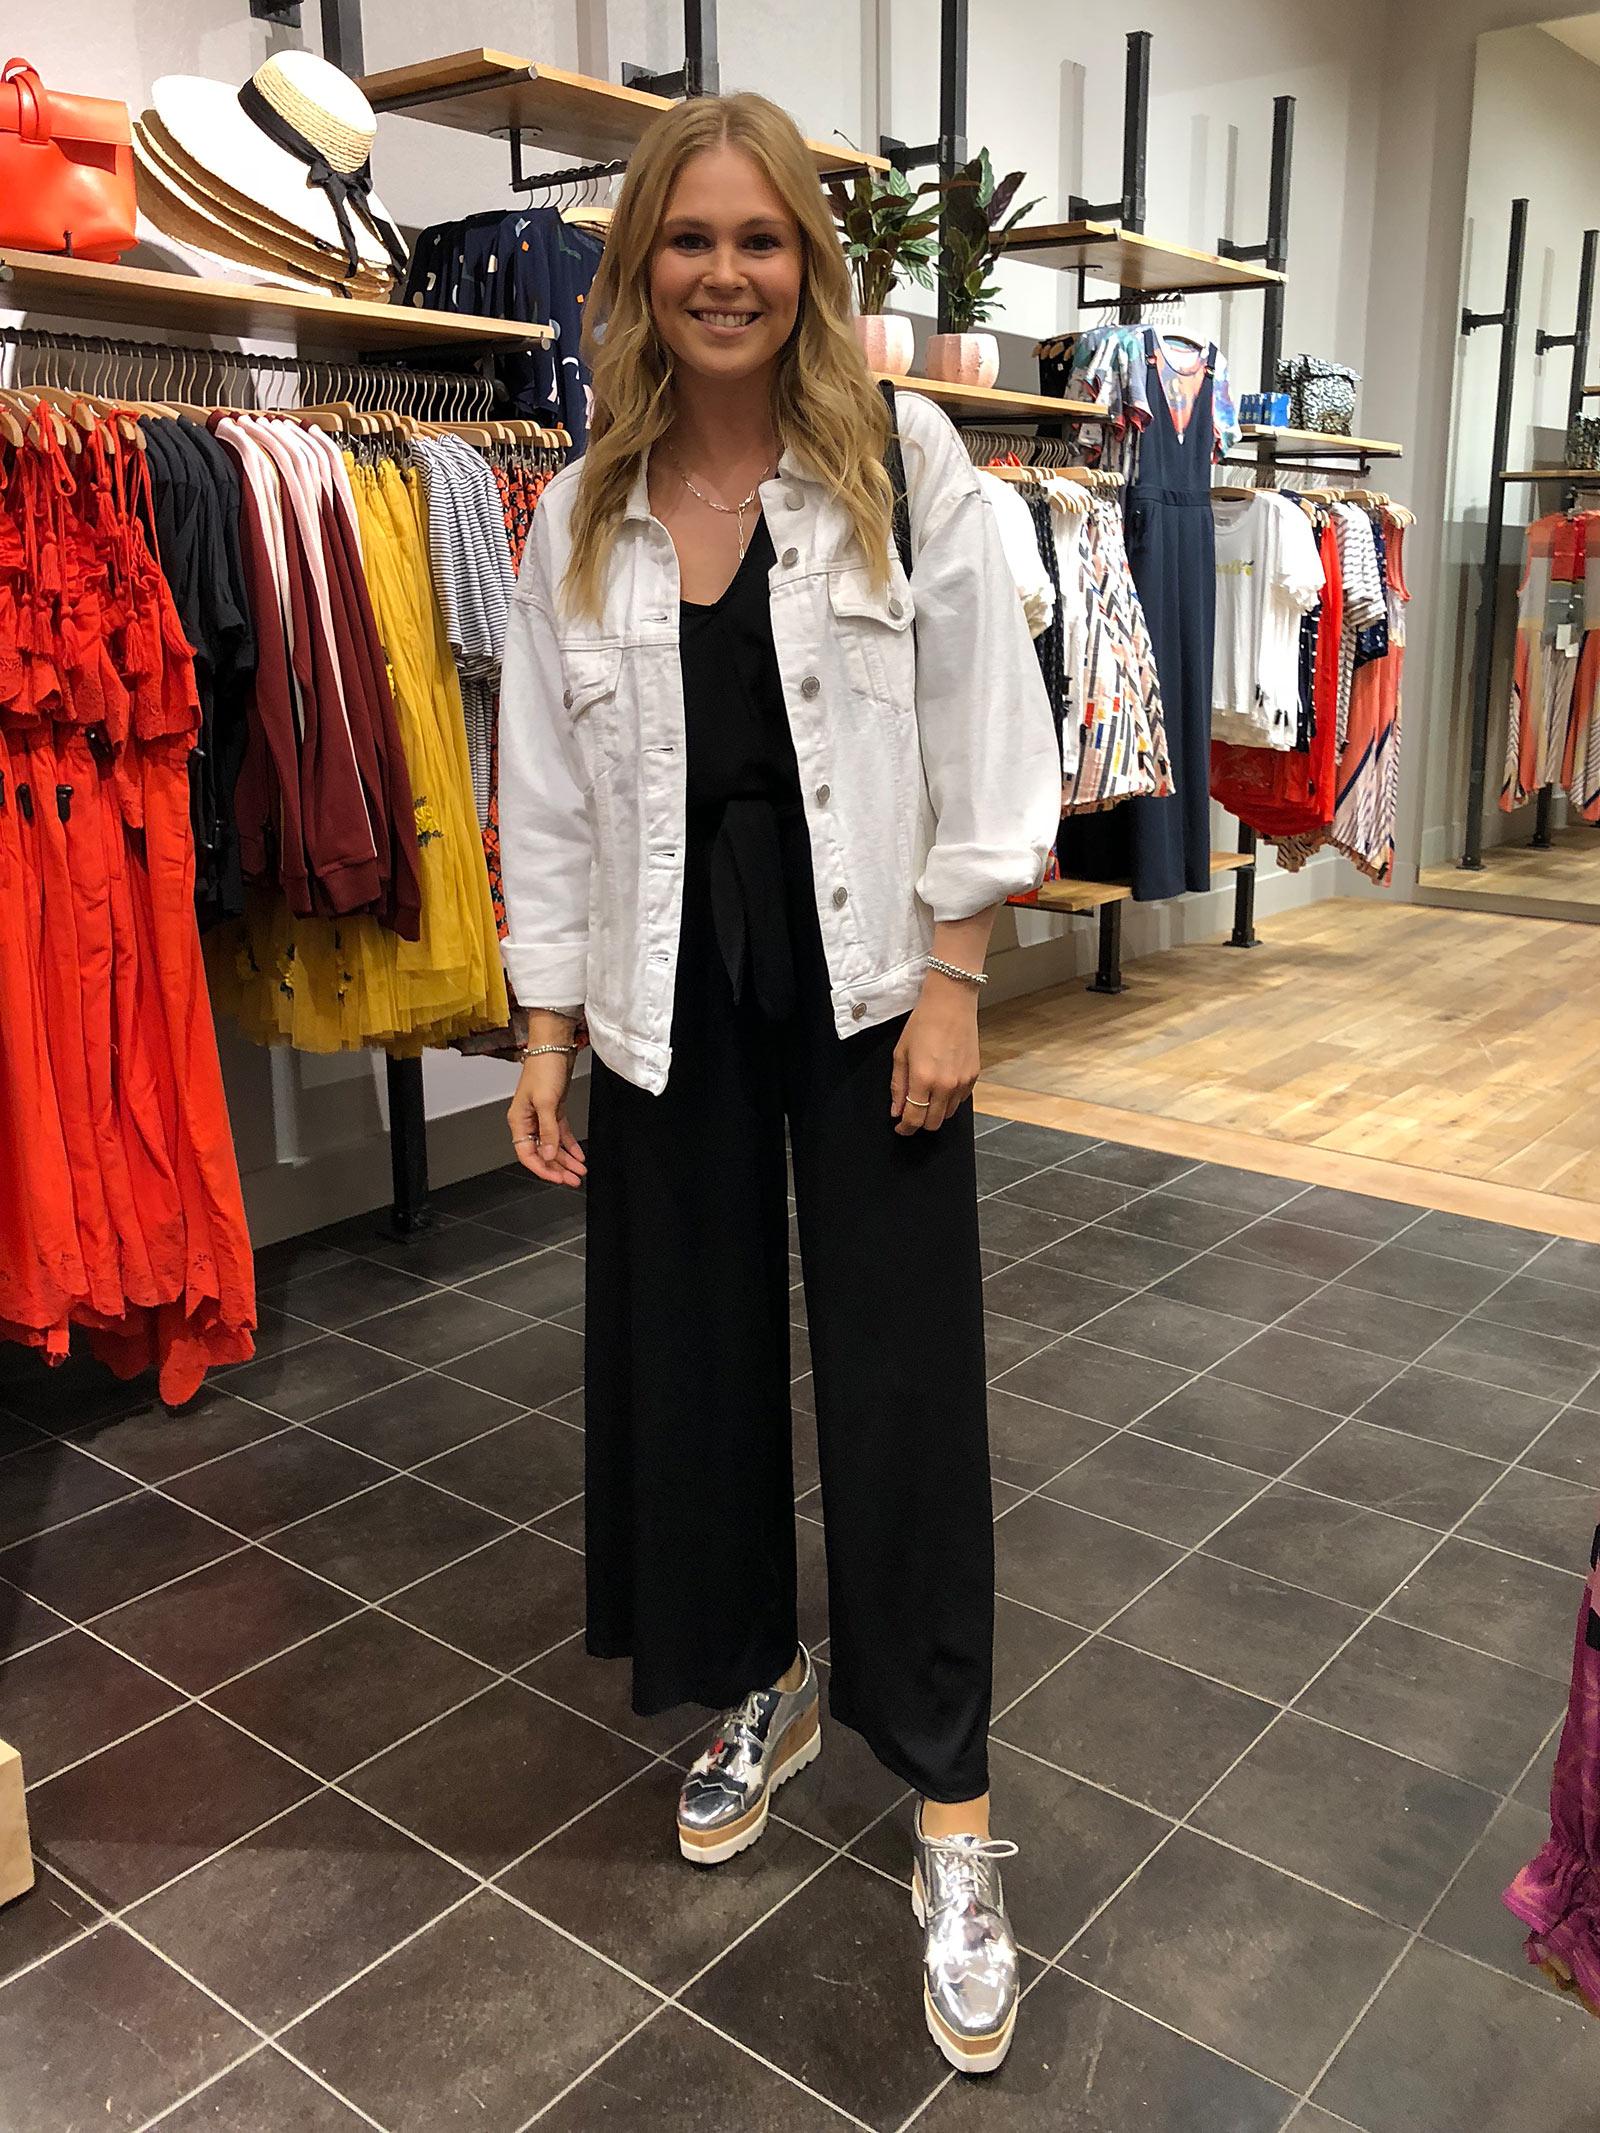 anthropologie store düsseldorf opening event fashion blogger sunnyinga